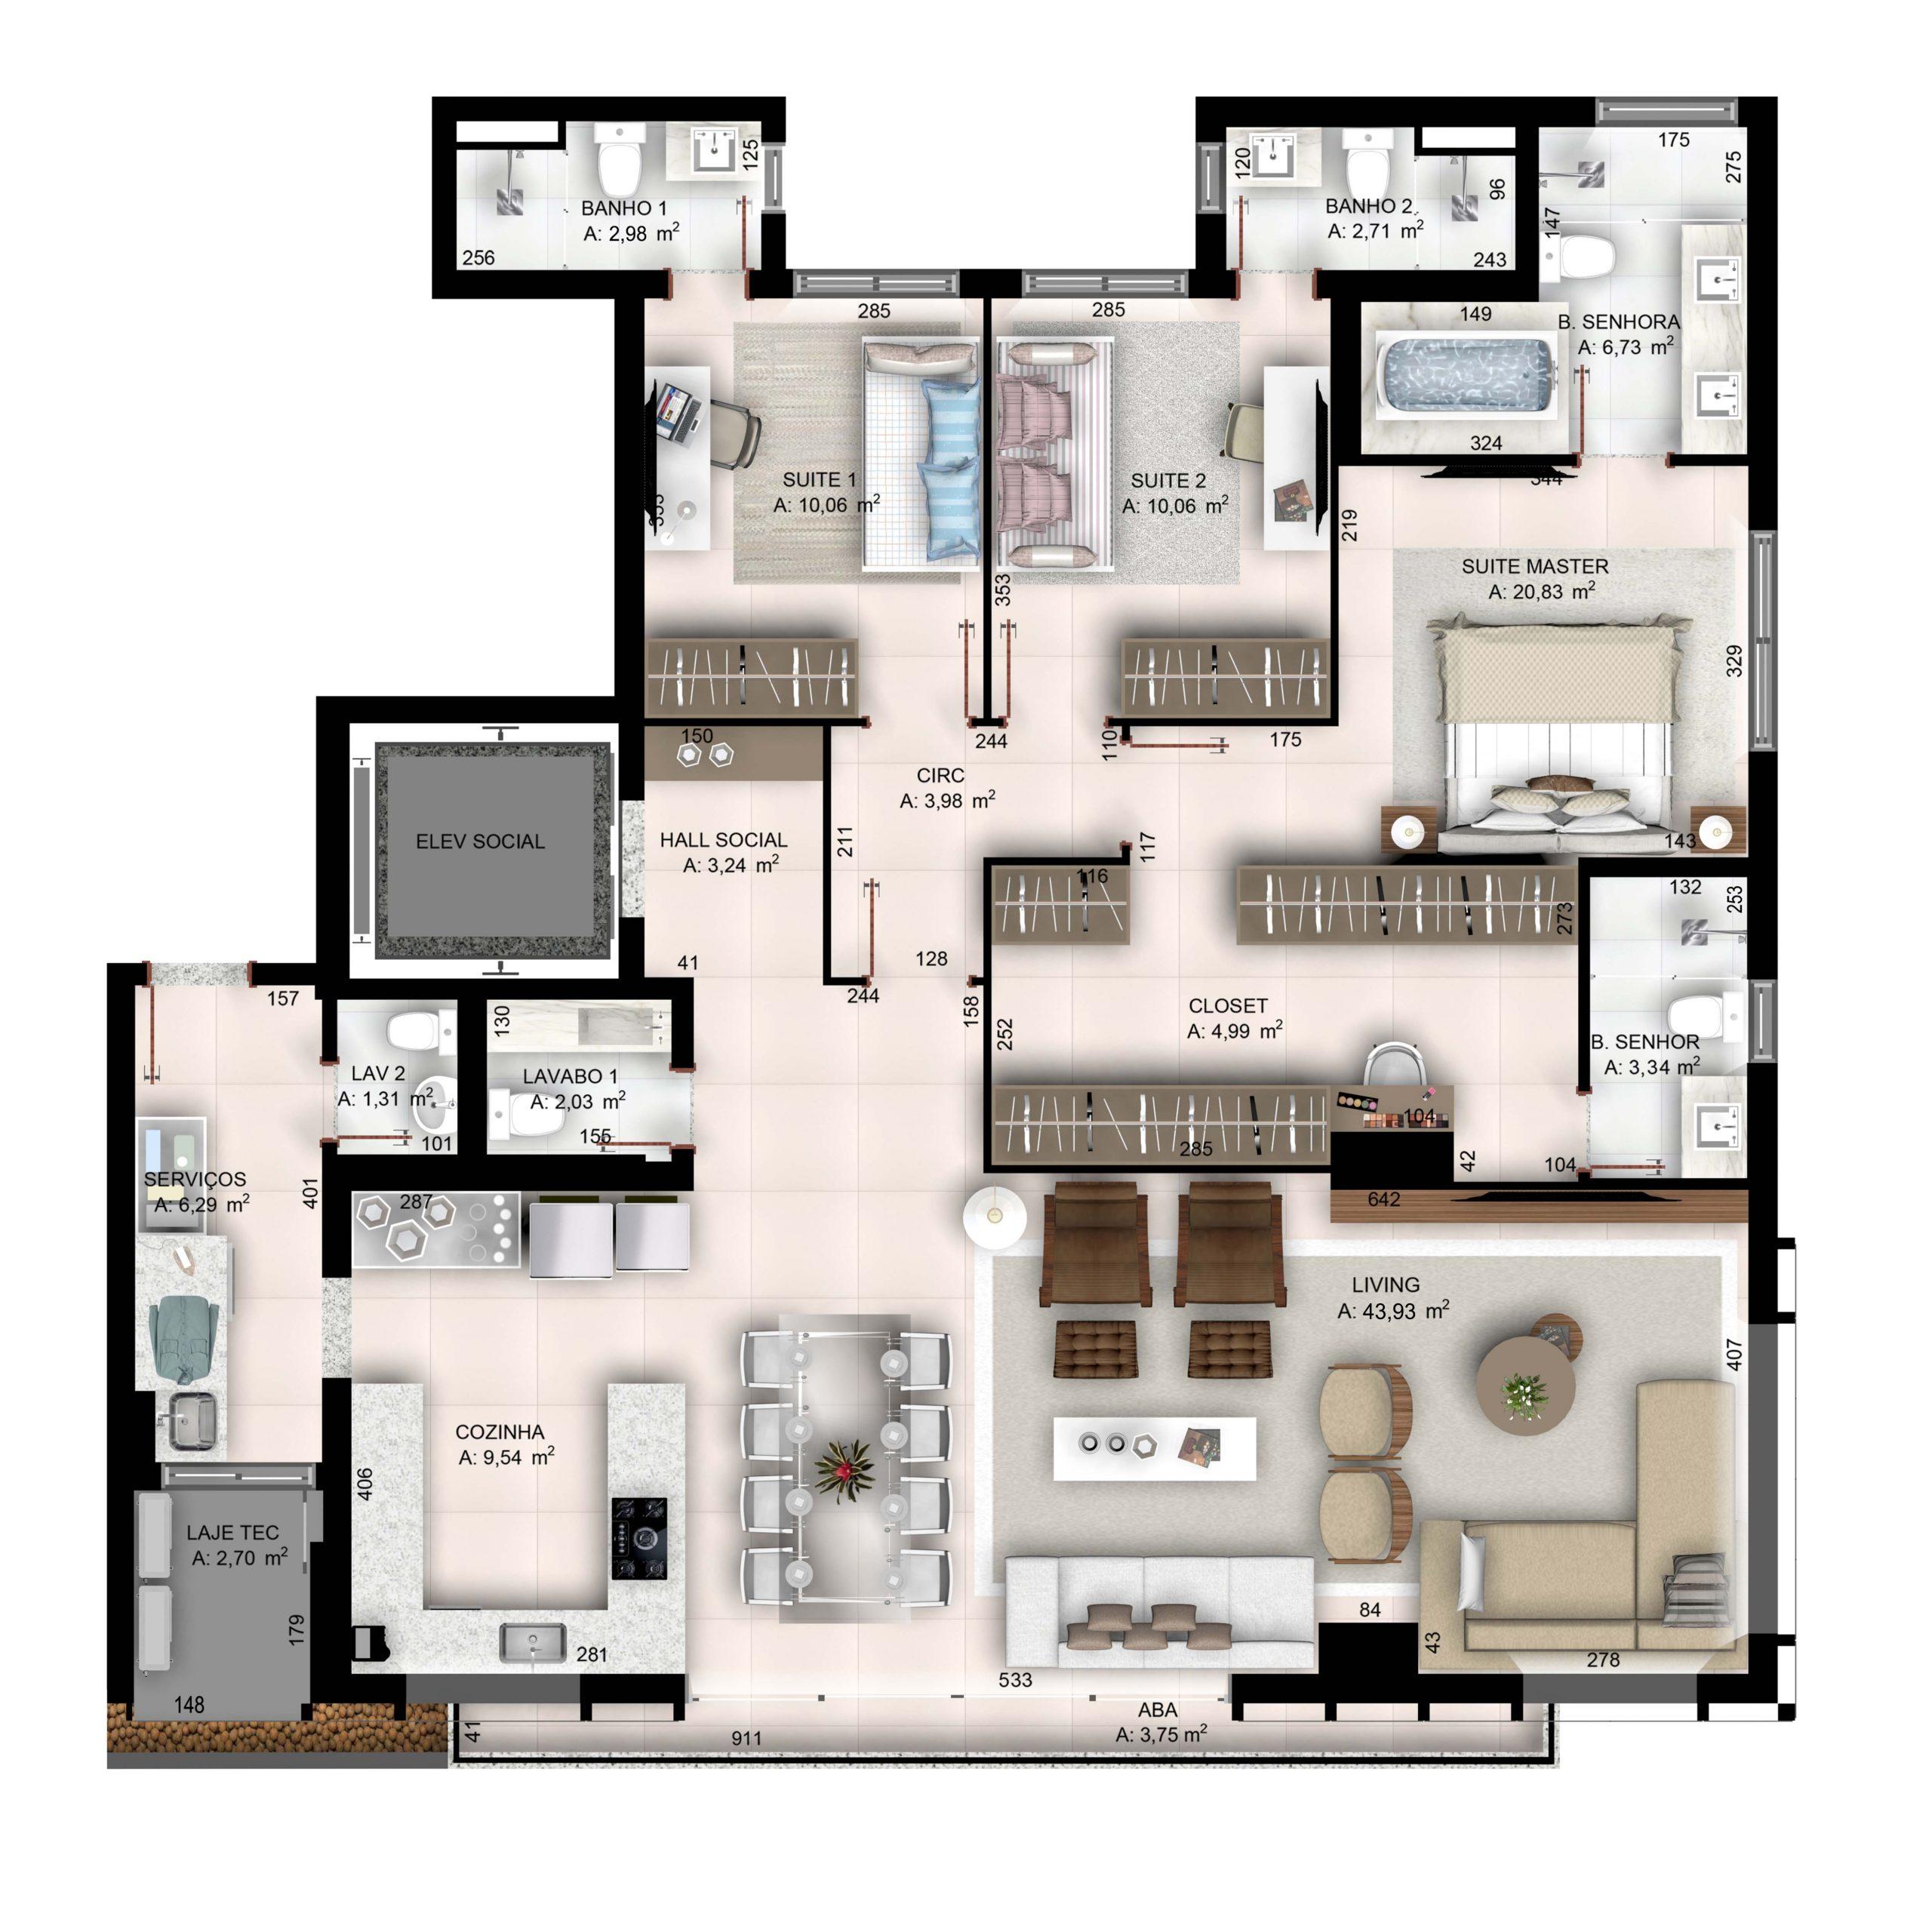 3 suítes plenas com sala ampliada - 171,45 m²